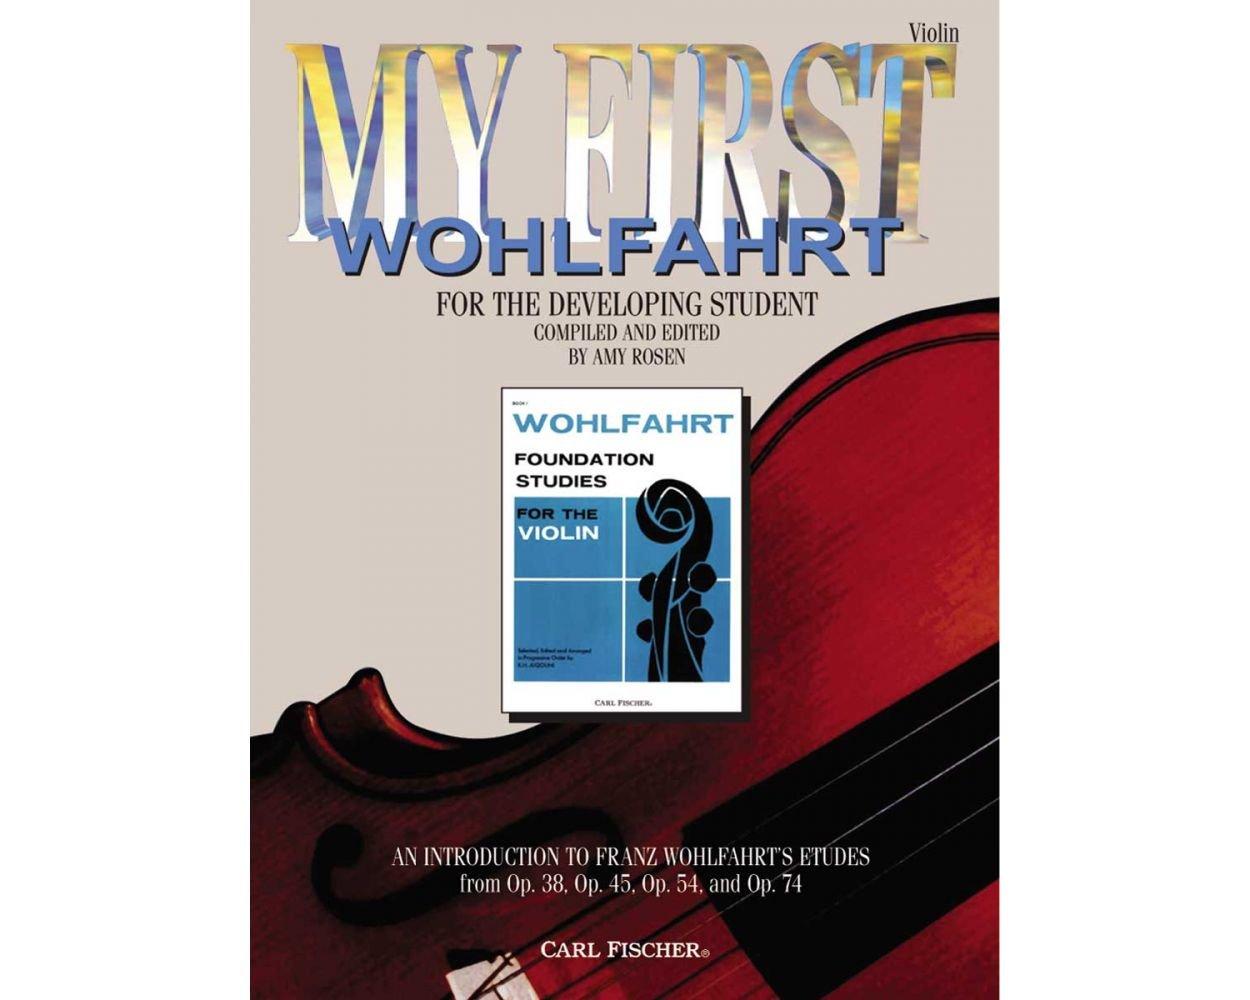 An Introduction To Franz Wohlfahrt's Etudes - Violin